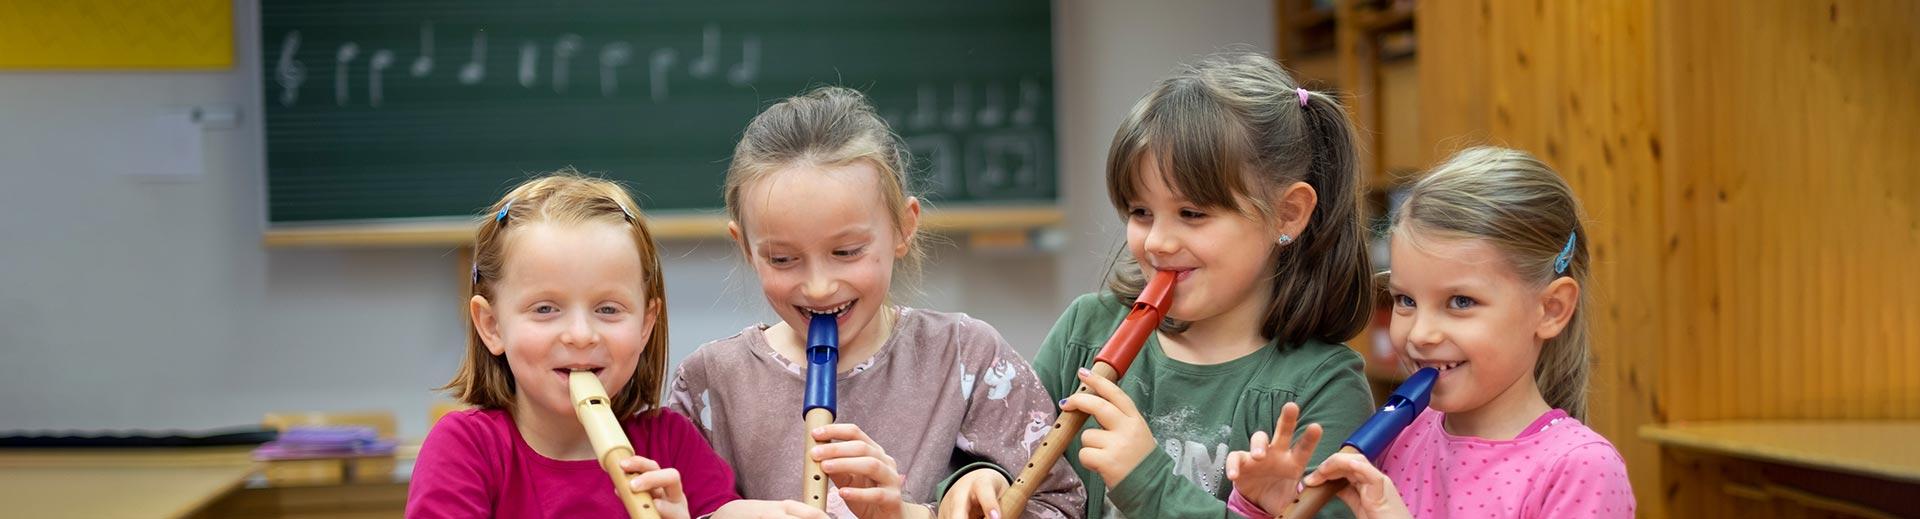 Blockflötenspielkreis – Musikschule Bayreuth